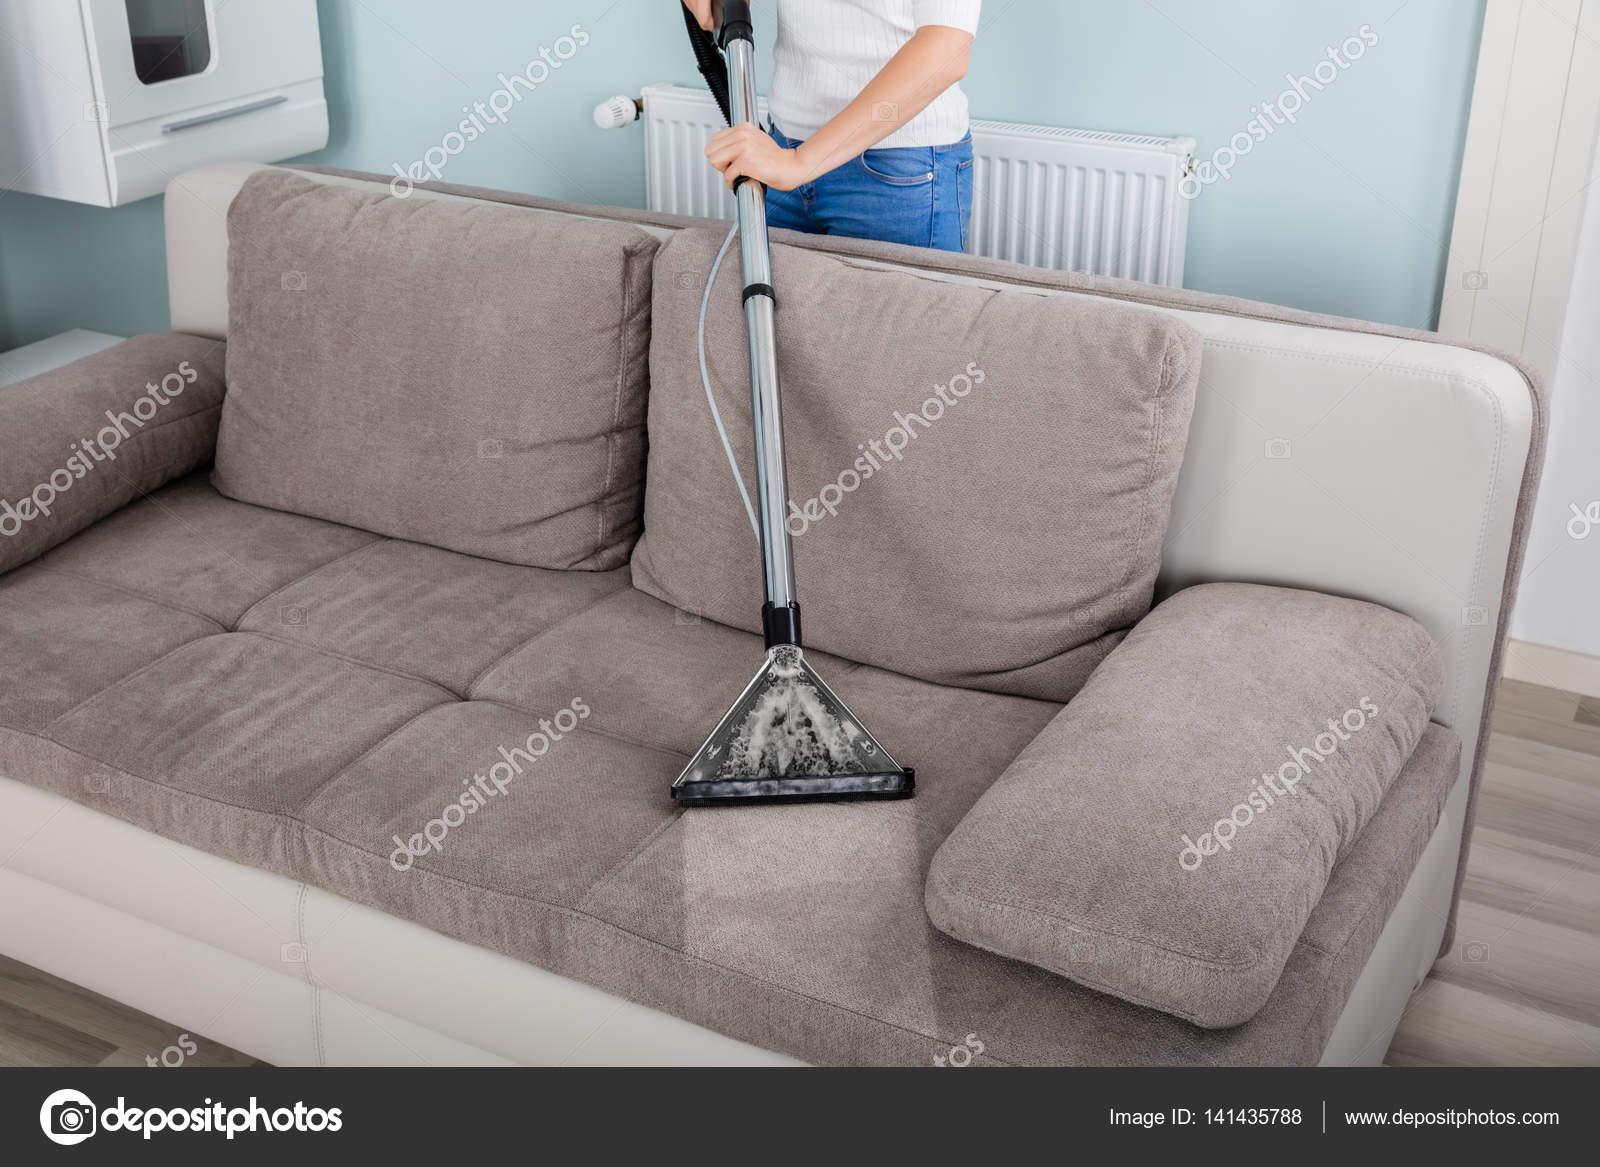 Sofa Vacuum Karcher Carpet Sofa Wet Vacuum Cle End 7 2017